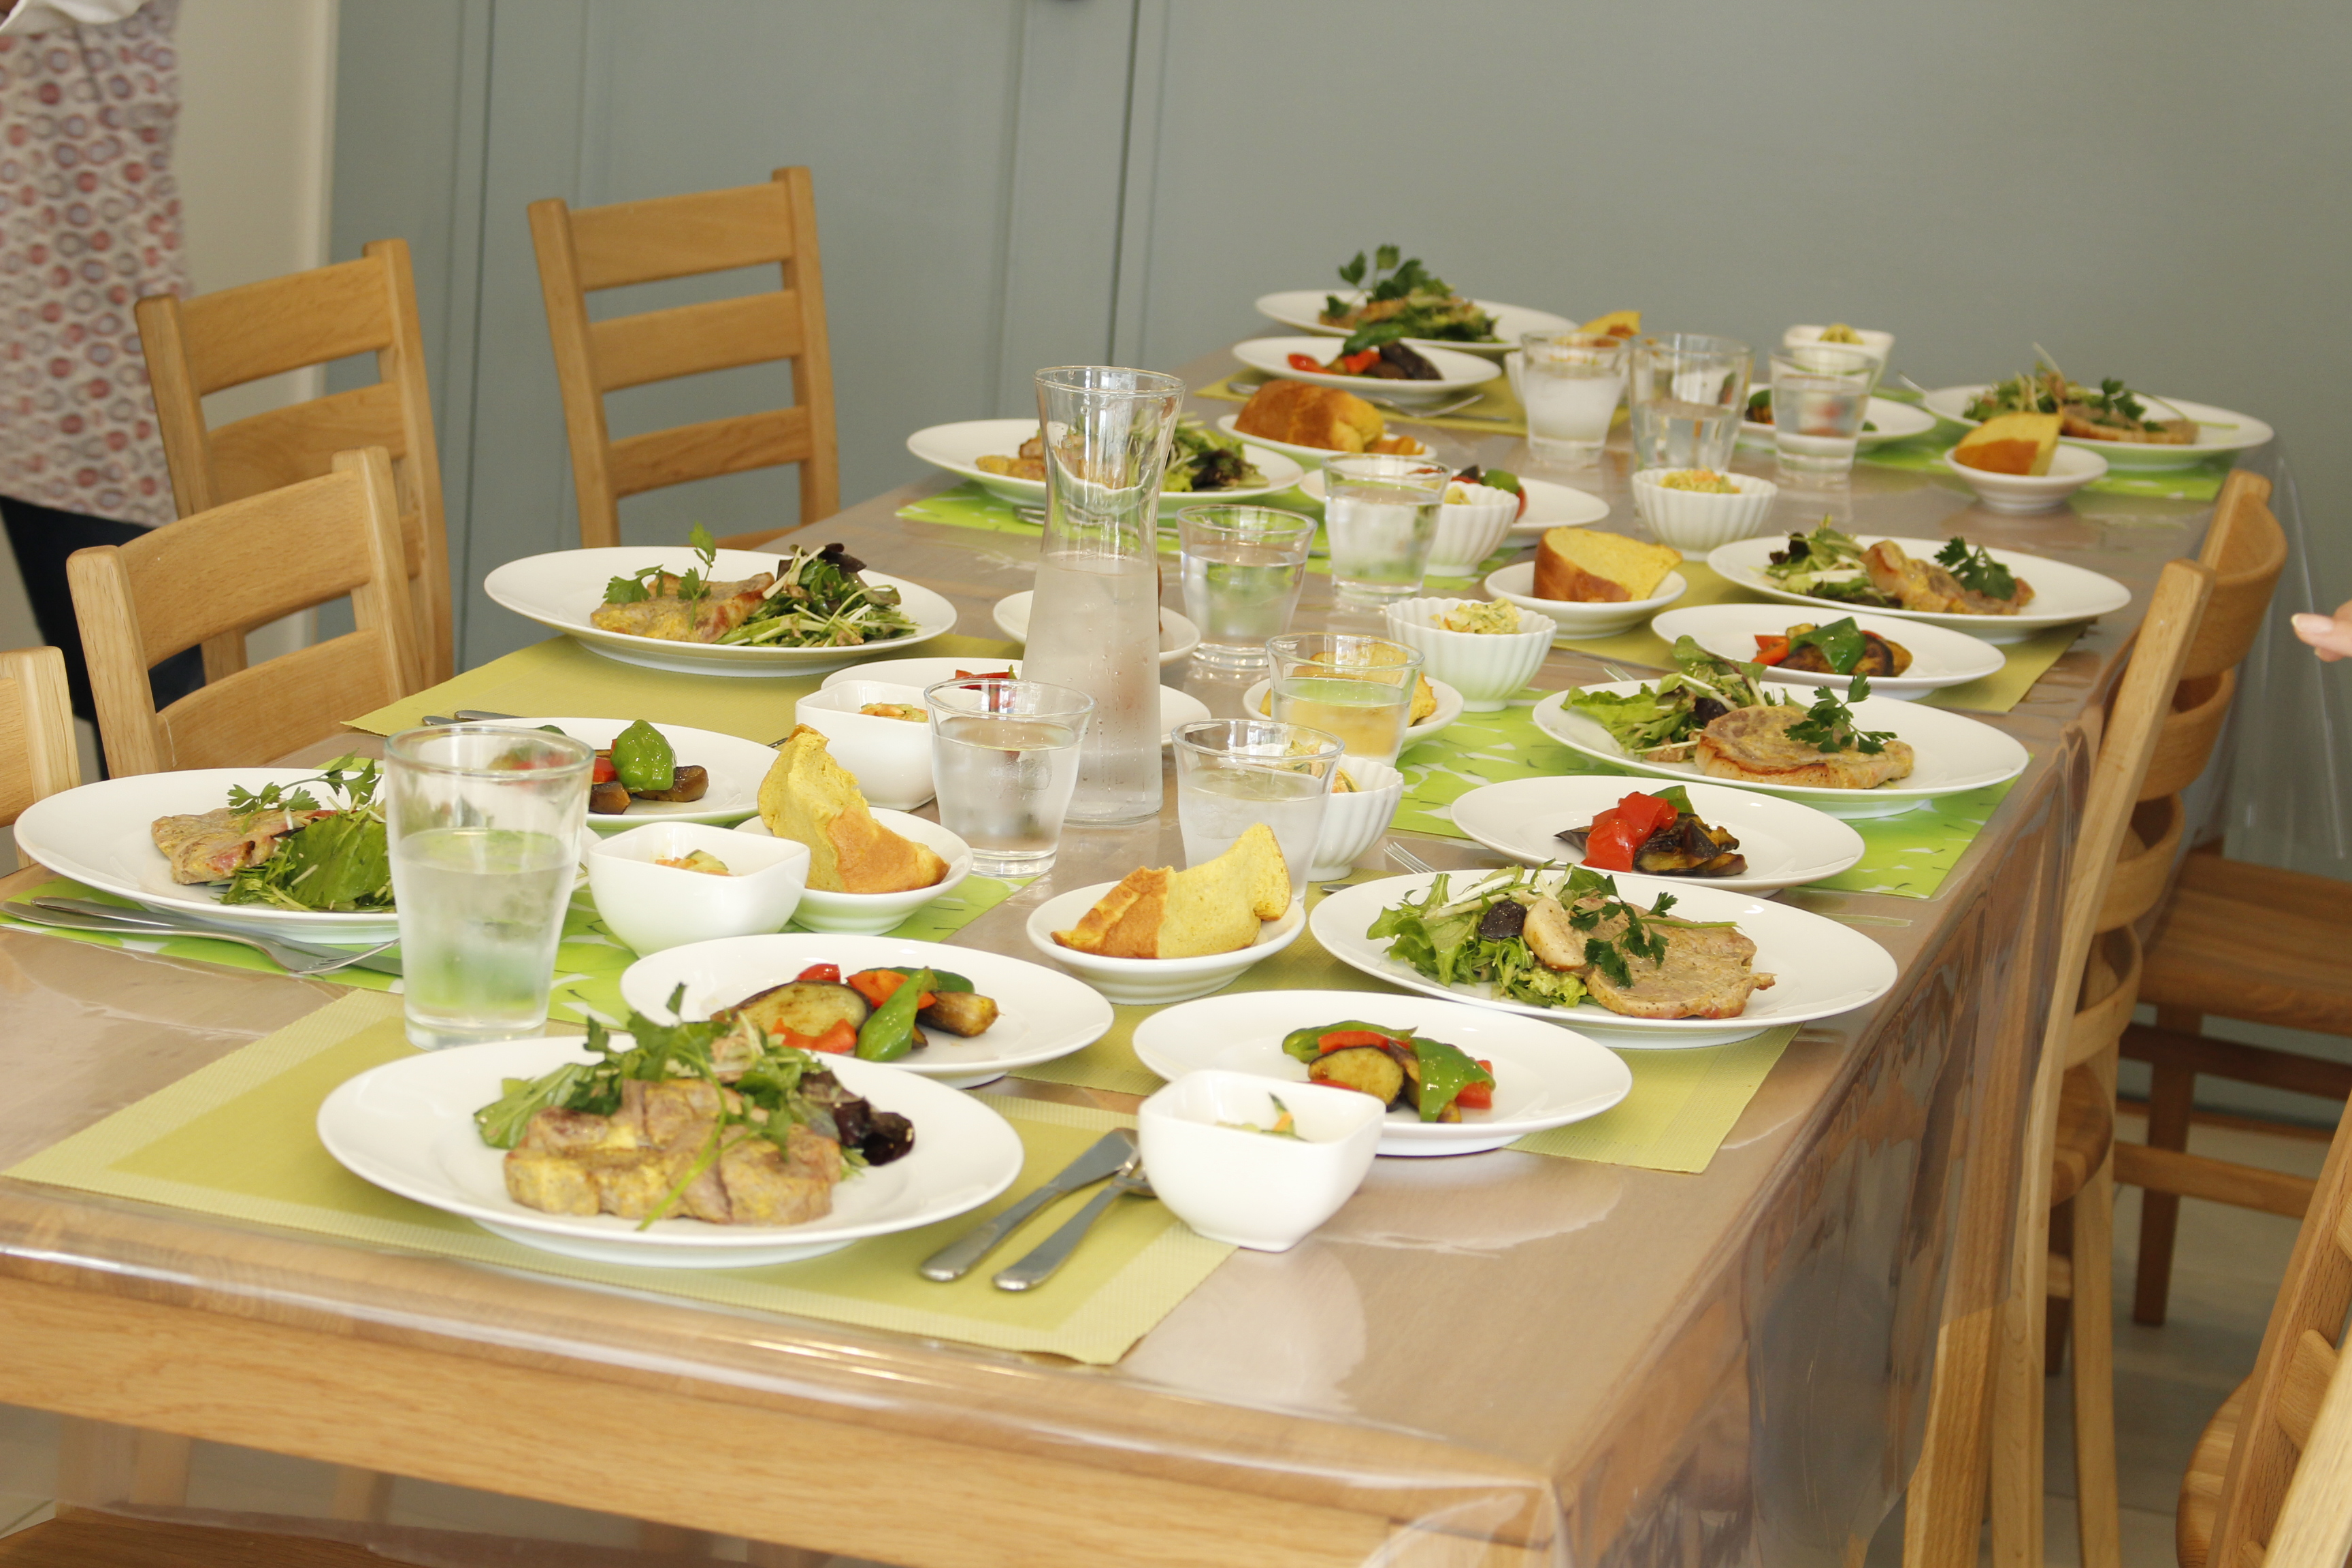 -ta-sante糖質制限パン料理教室。4月度『糖質制限家庭料理教室』3日目阿倍野区西田辺。